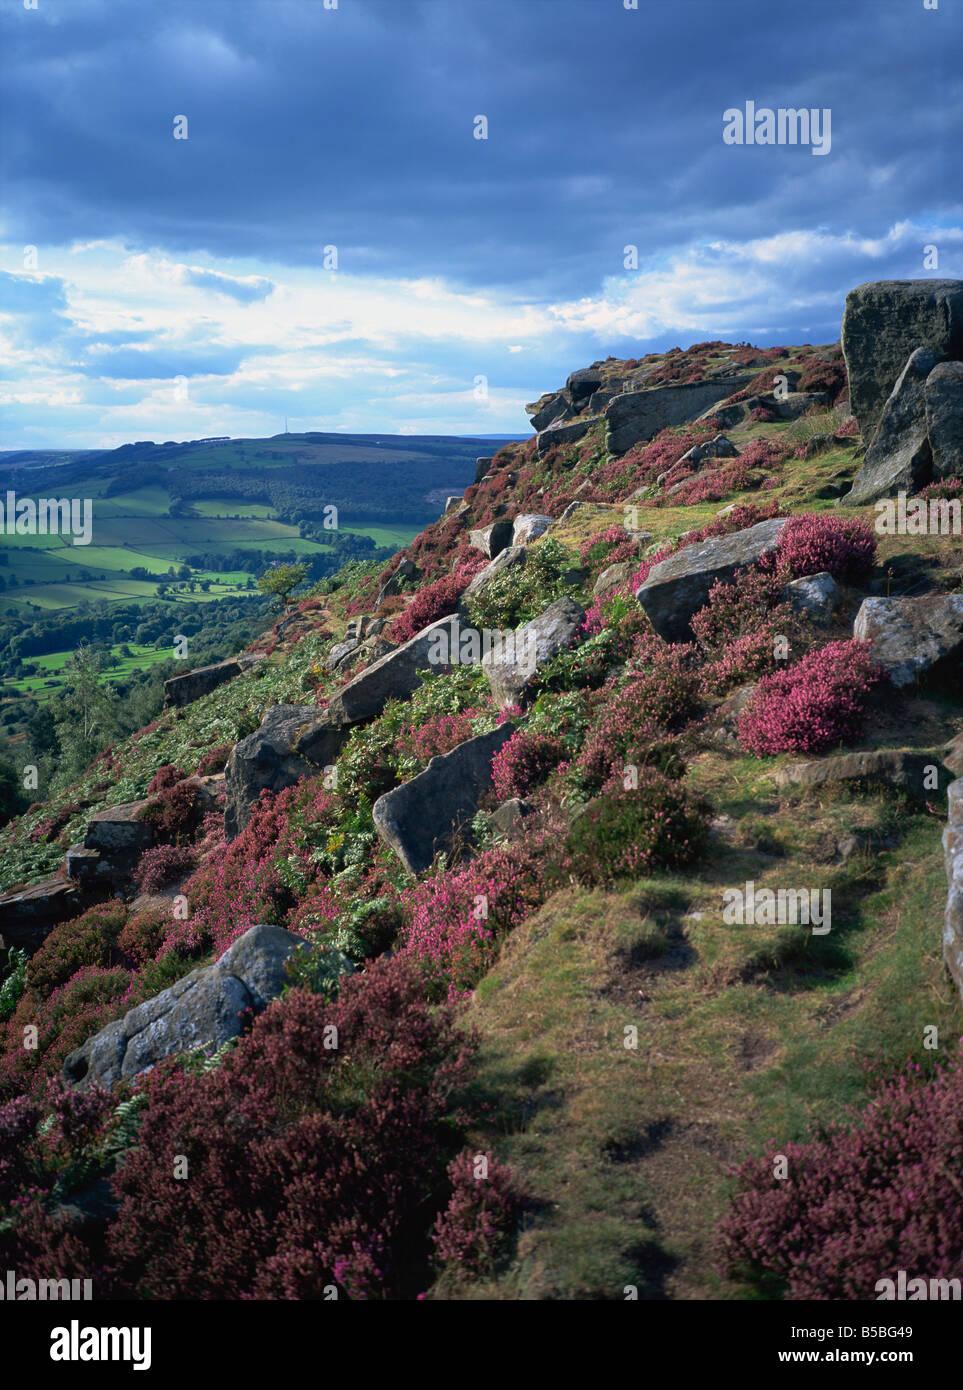 Heather and rocky terrain, Froggatt Edge, Derbyshire, England, Europe - Stock Image